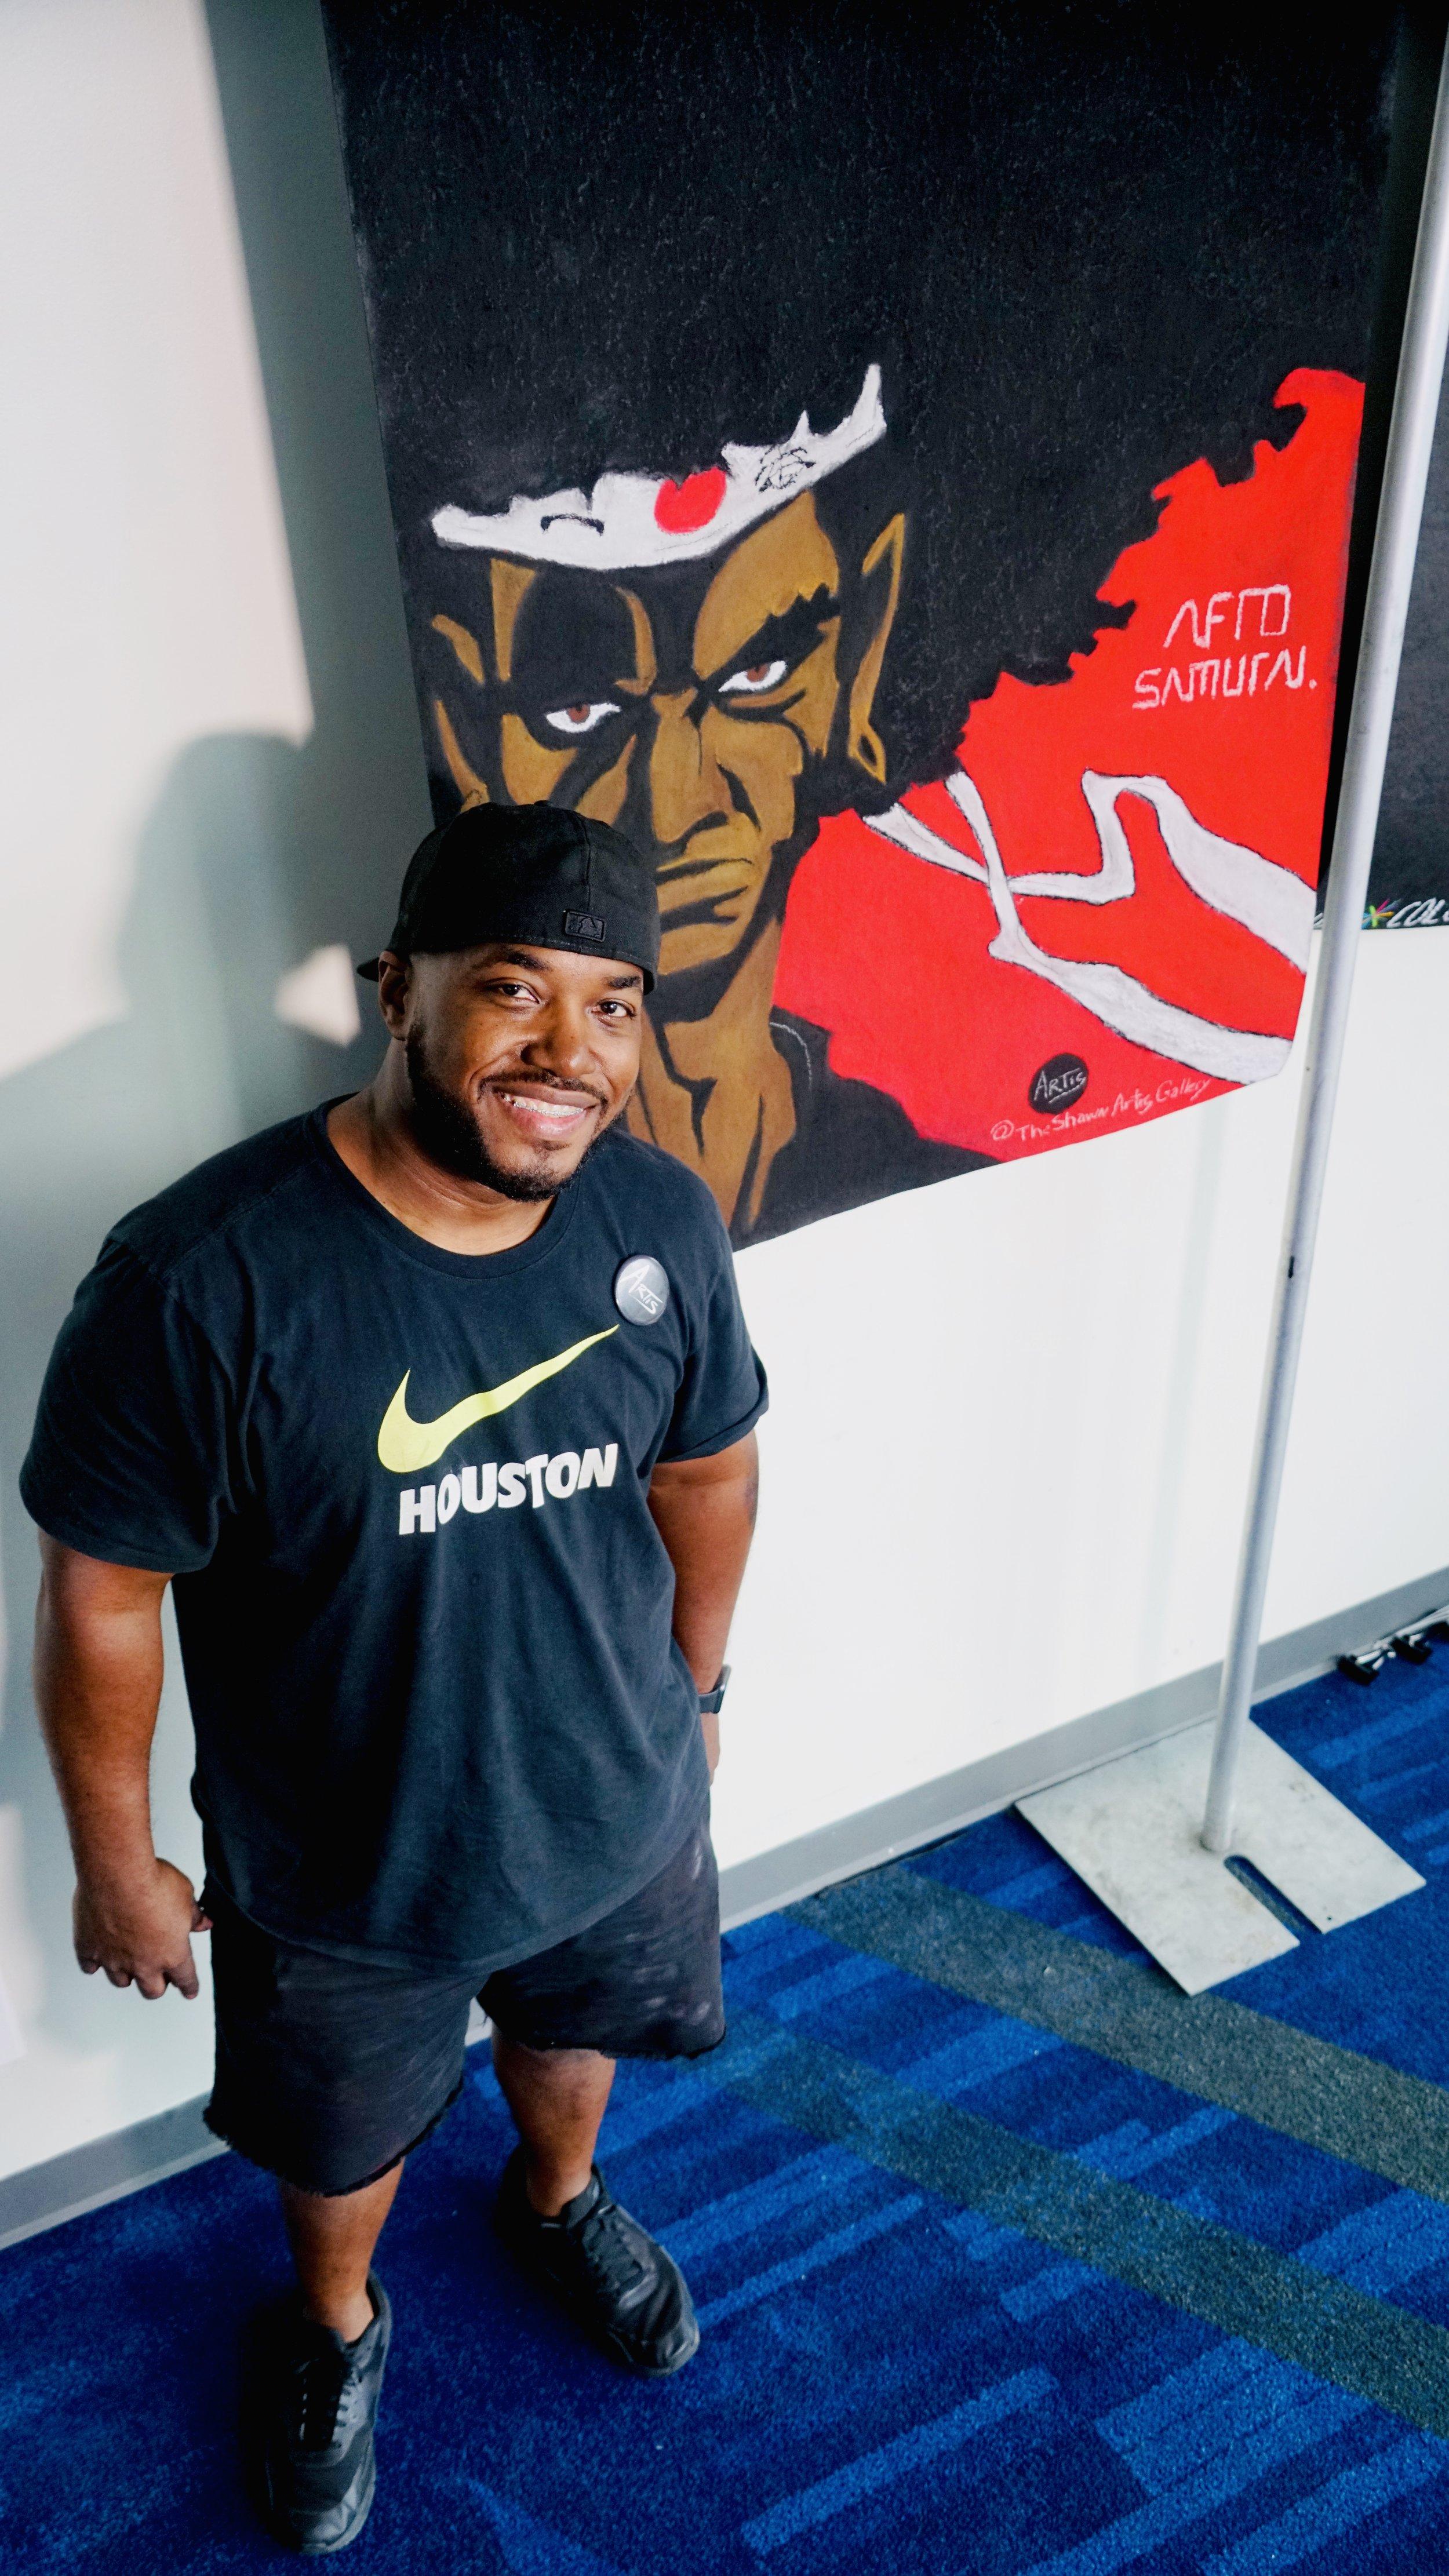 Afro Samurai created live at Comicapalooza 2019